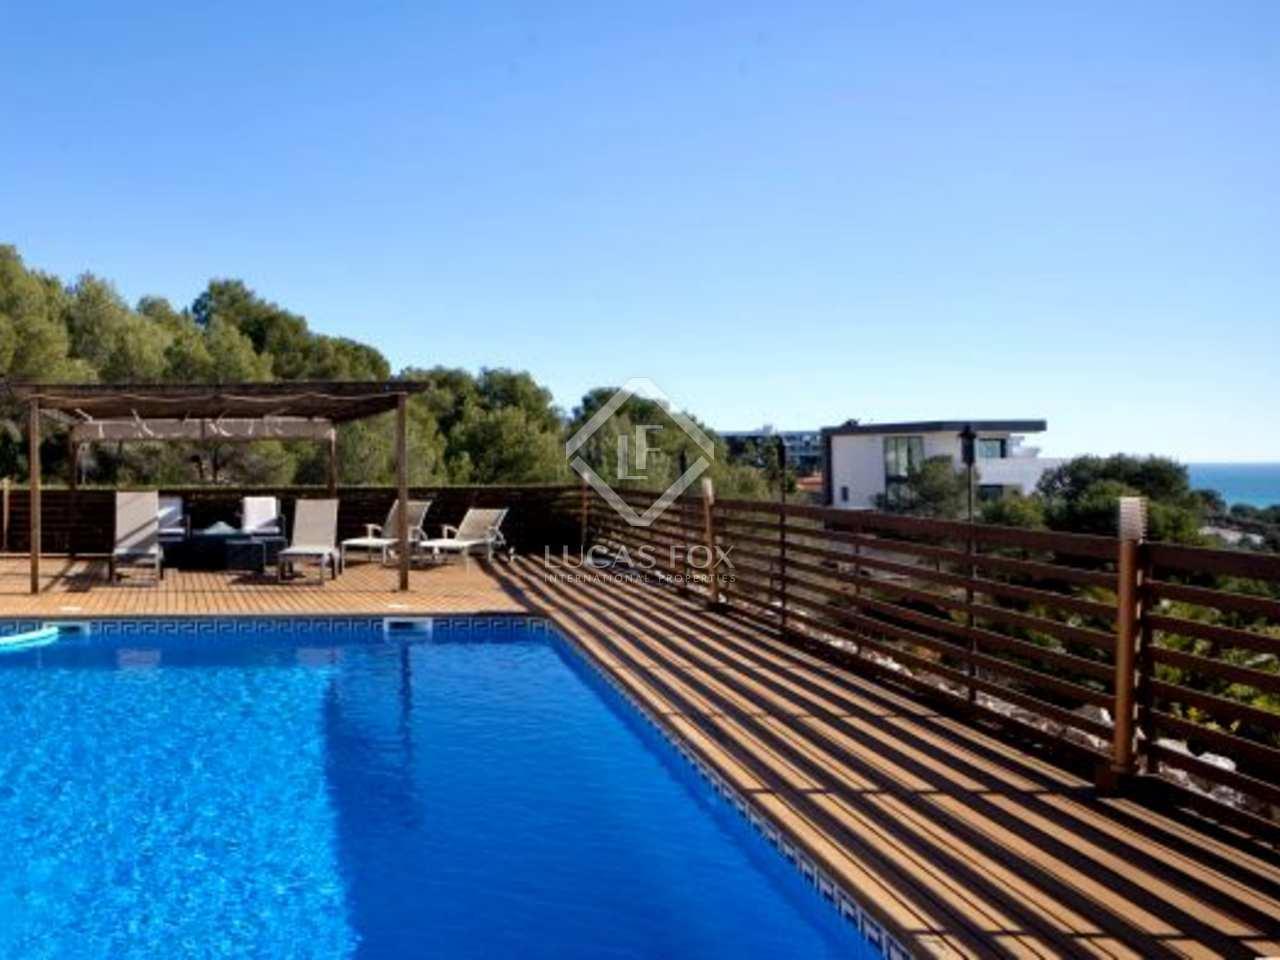 Villa grande y moderna con piscina en venta en can girona for Piscina sitges